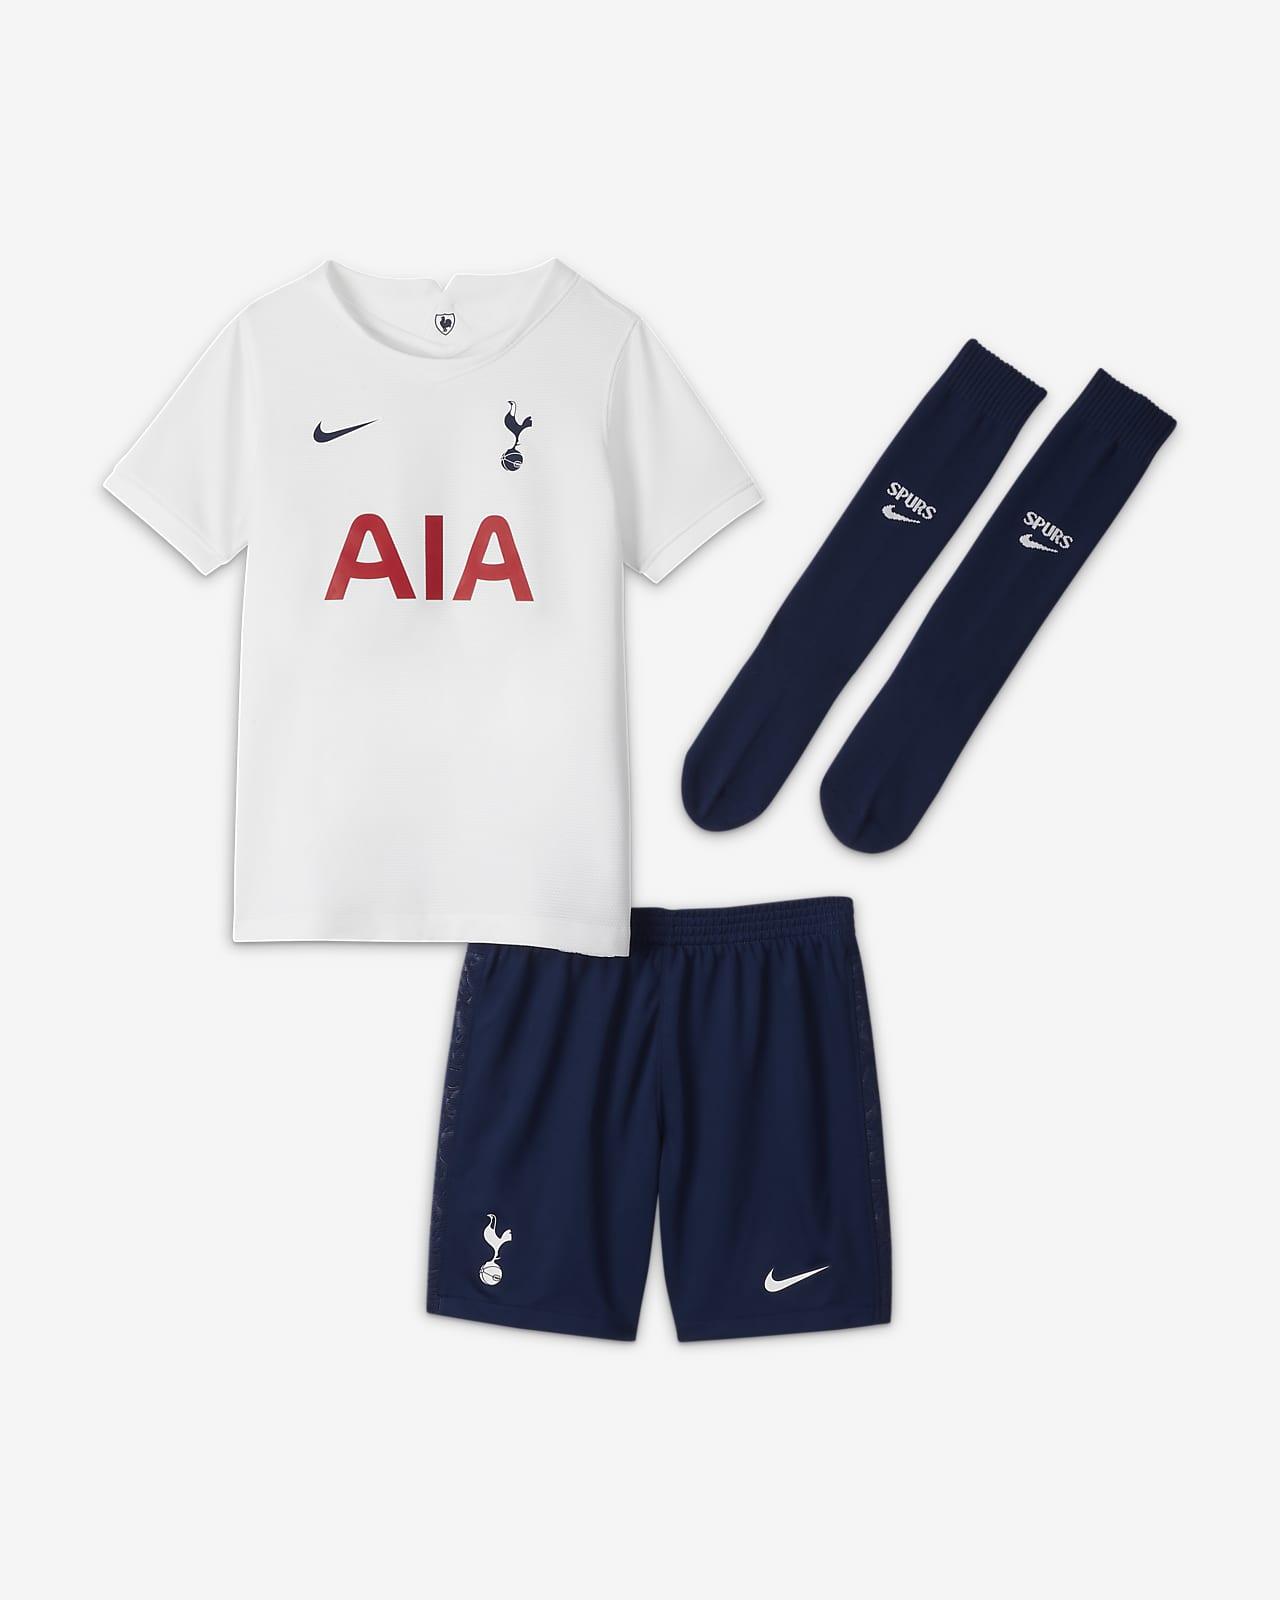 Tottenham Hotspur FC 2021/22 Home Fußballtrikot-Set für jüngere Kinder